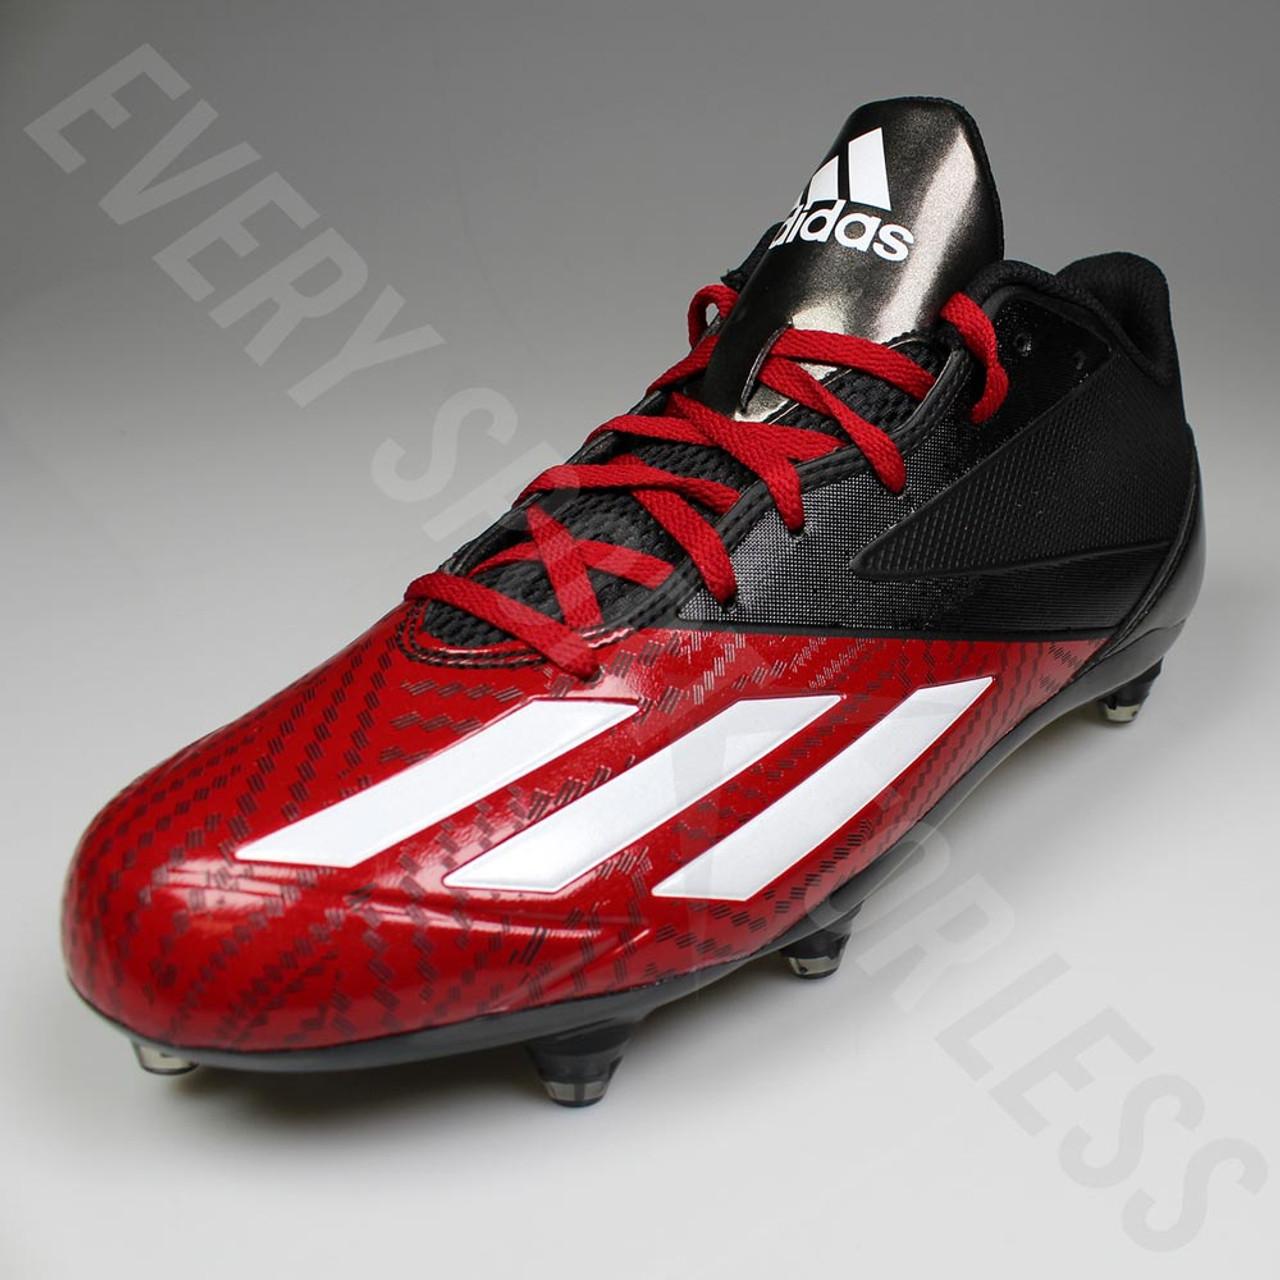 dbb6970832e ... Adidas Adizero 5-Star Low D Football Lacrosse Cleats D70140 - Black